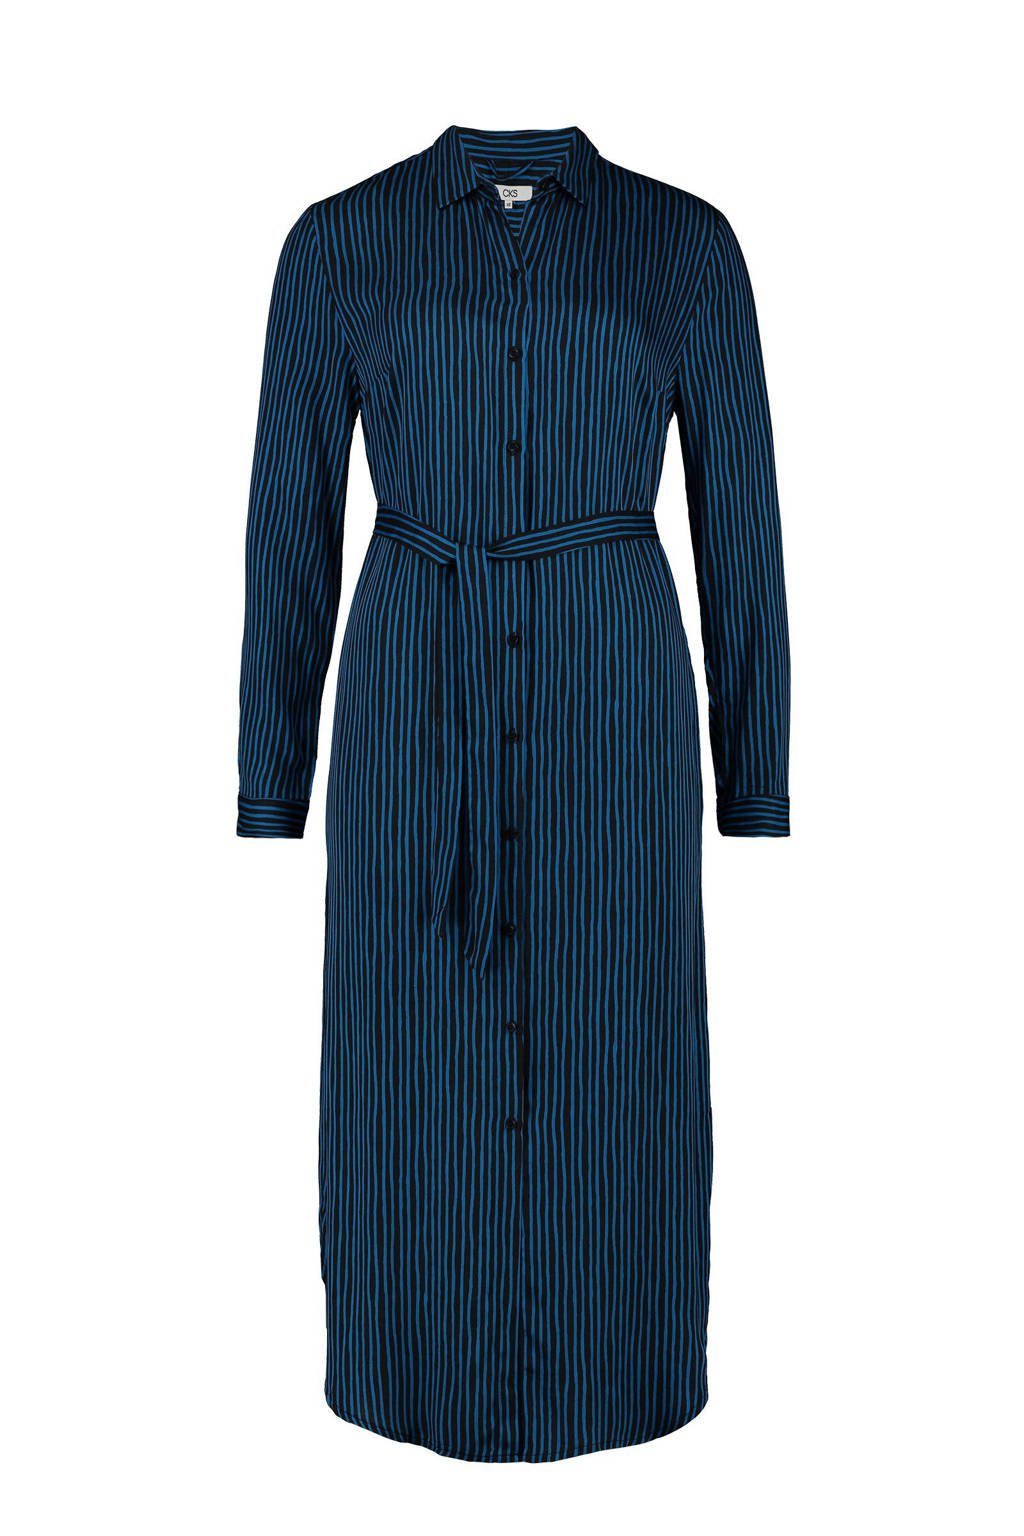 CKS Ela gestreepte blousejurk antraciet/blauw, Antraciet/blauw